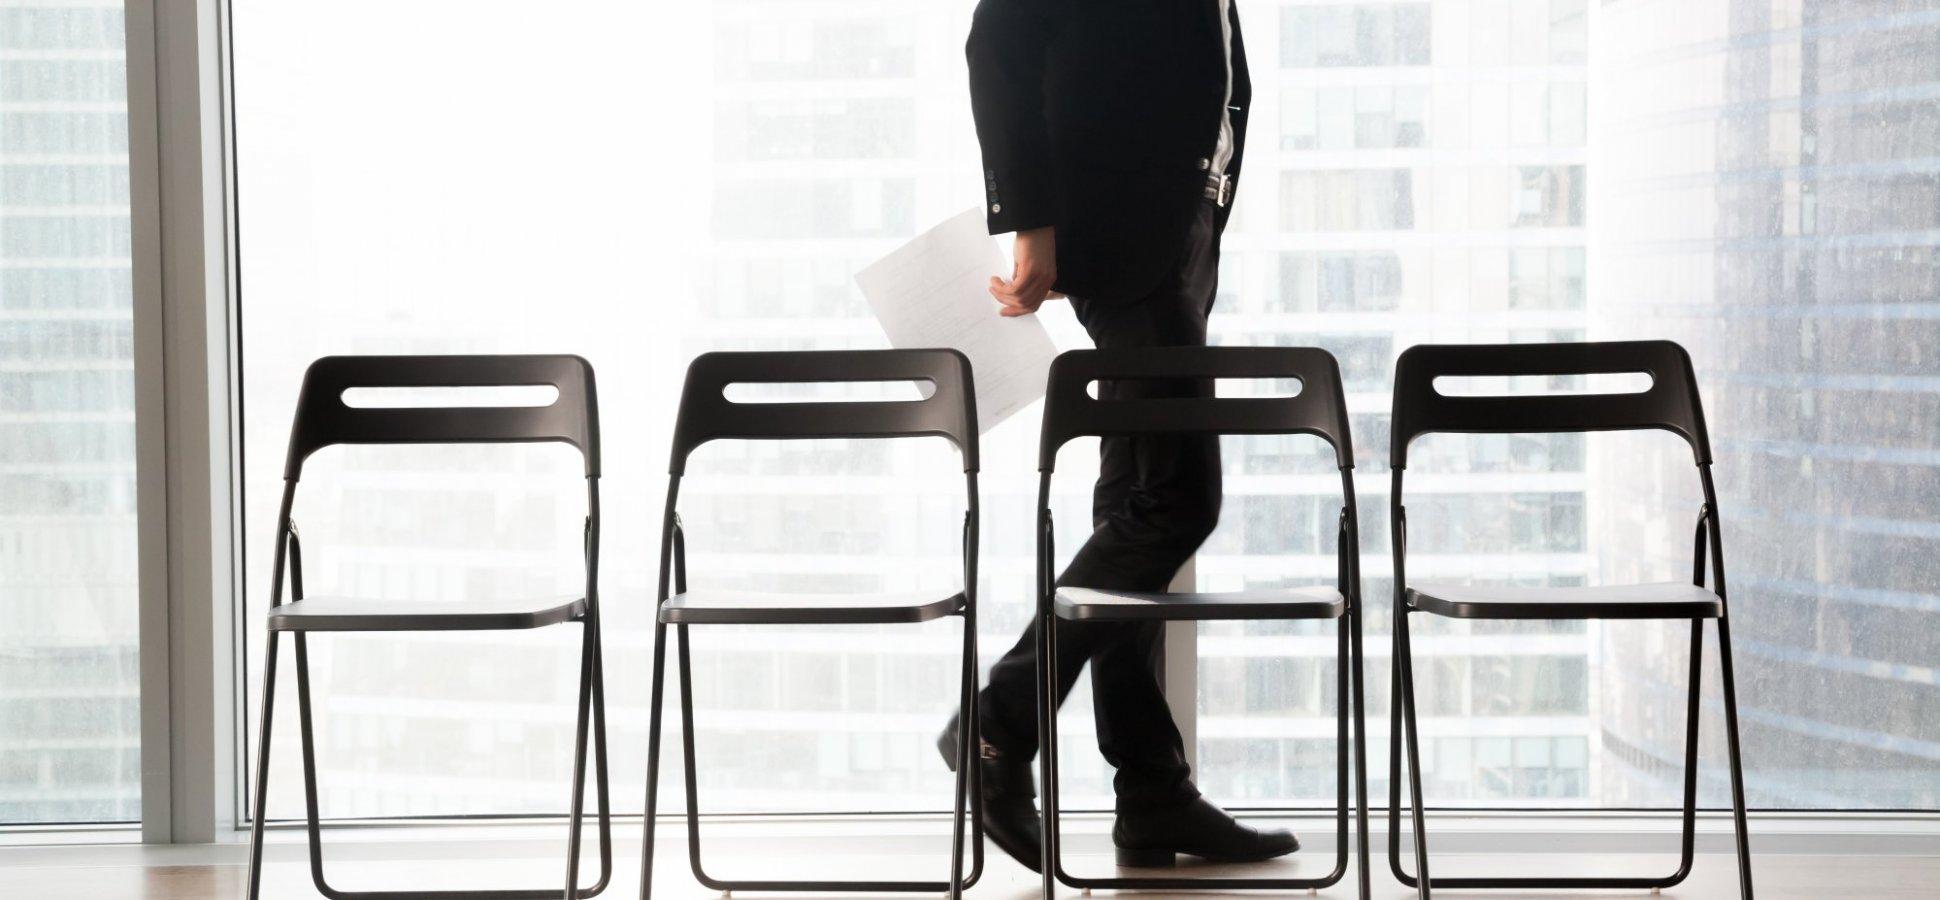 How Smart Leaders Handle Employee Turnover